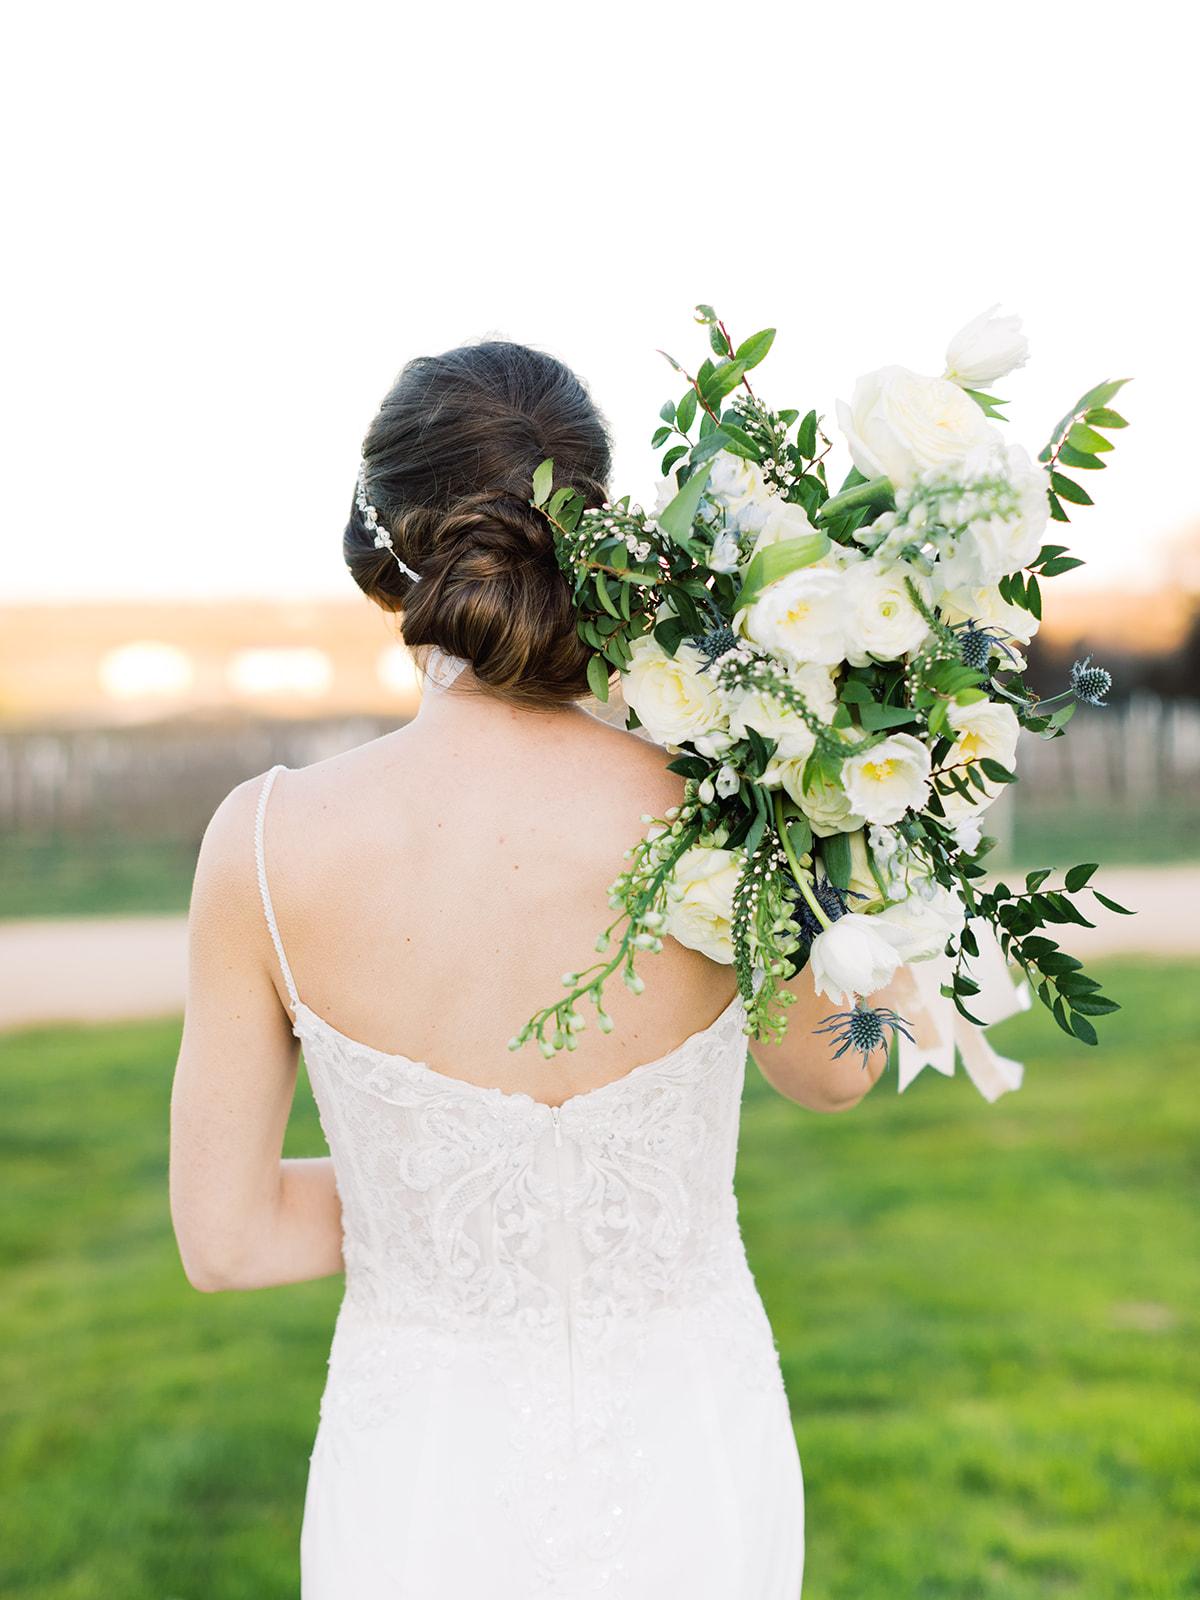 Wedding hair: Elopement vineyard wedding at Umbra Winery by Alexa Kay Events. See more wedding ideas at alexakayevents.com!